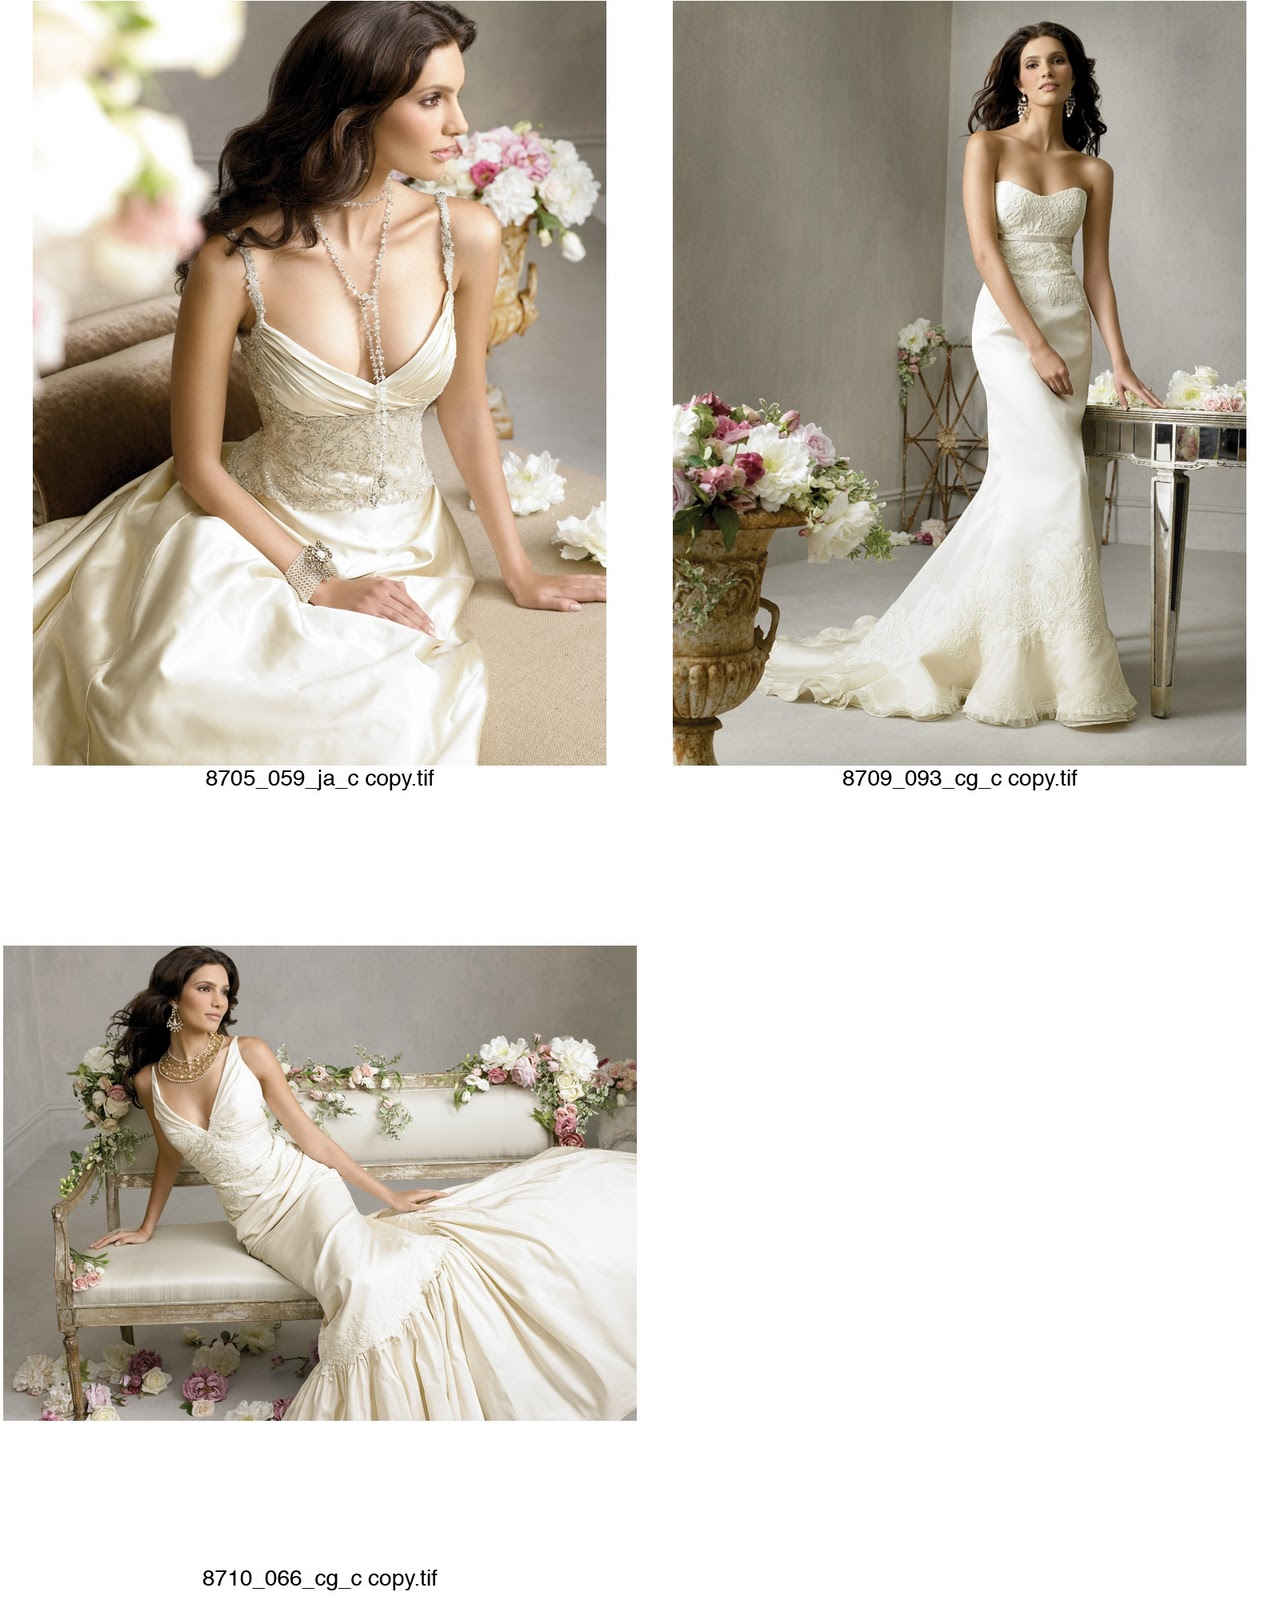 Bridal Gowns Orange County Mission Viejo Ca : Orange county bride magazine gt nov th jim hjelm